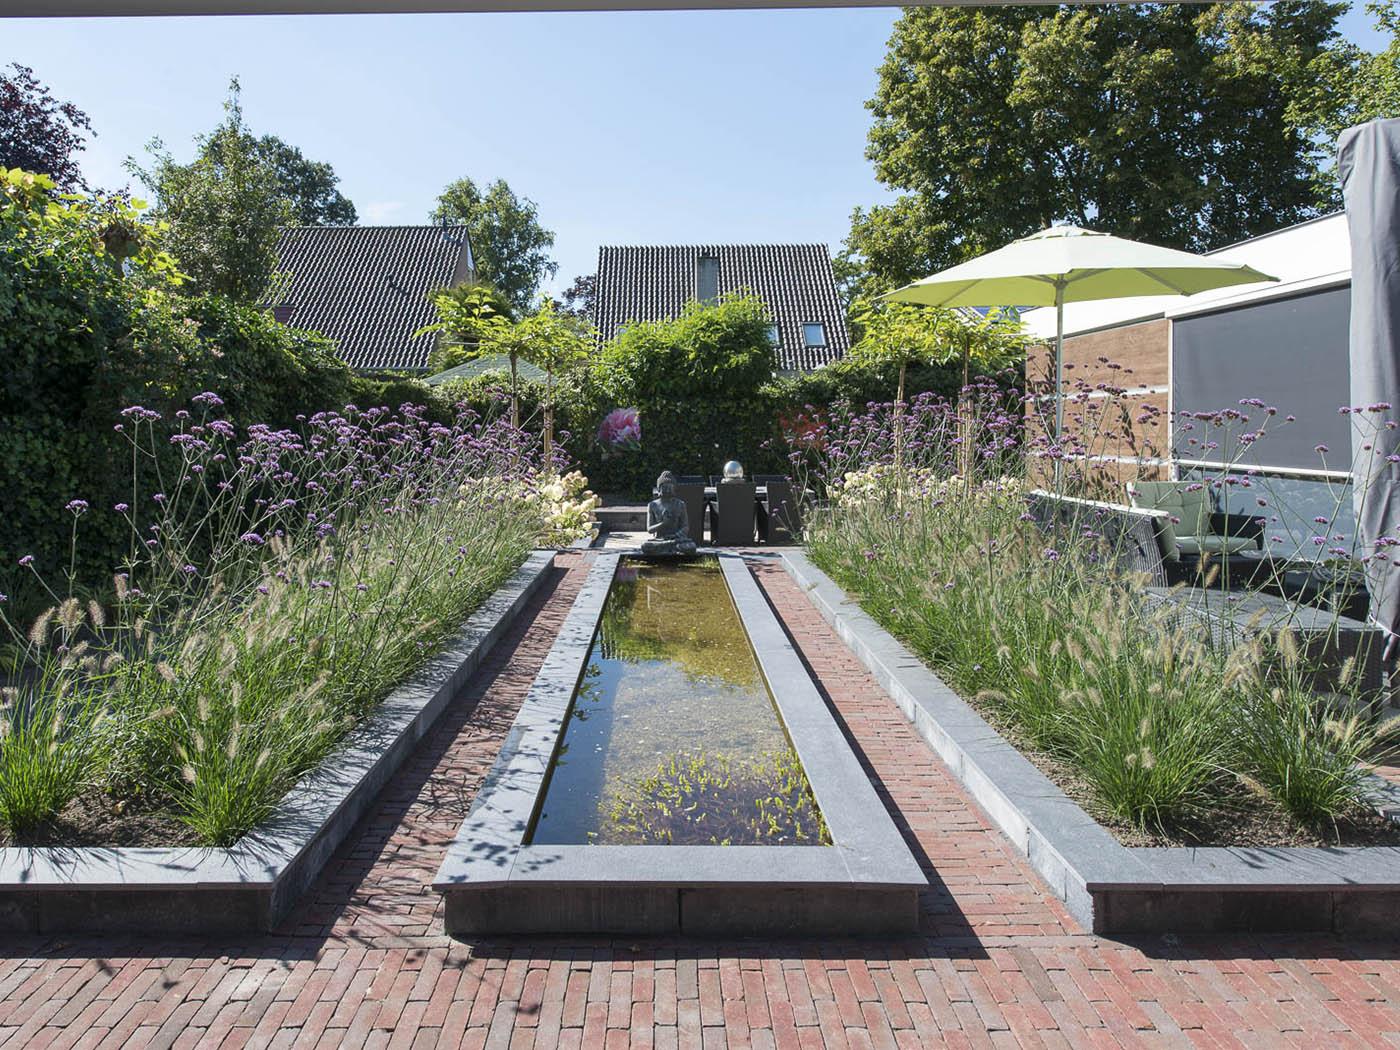 Tuin groter laten lijken slideshow image with tuin groter for Spiegelvijver maken